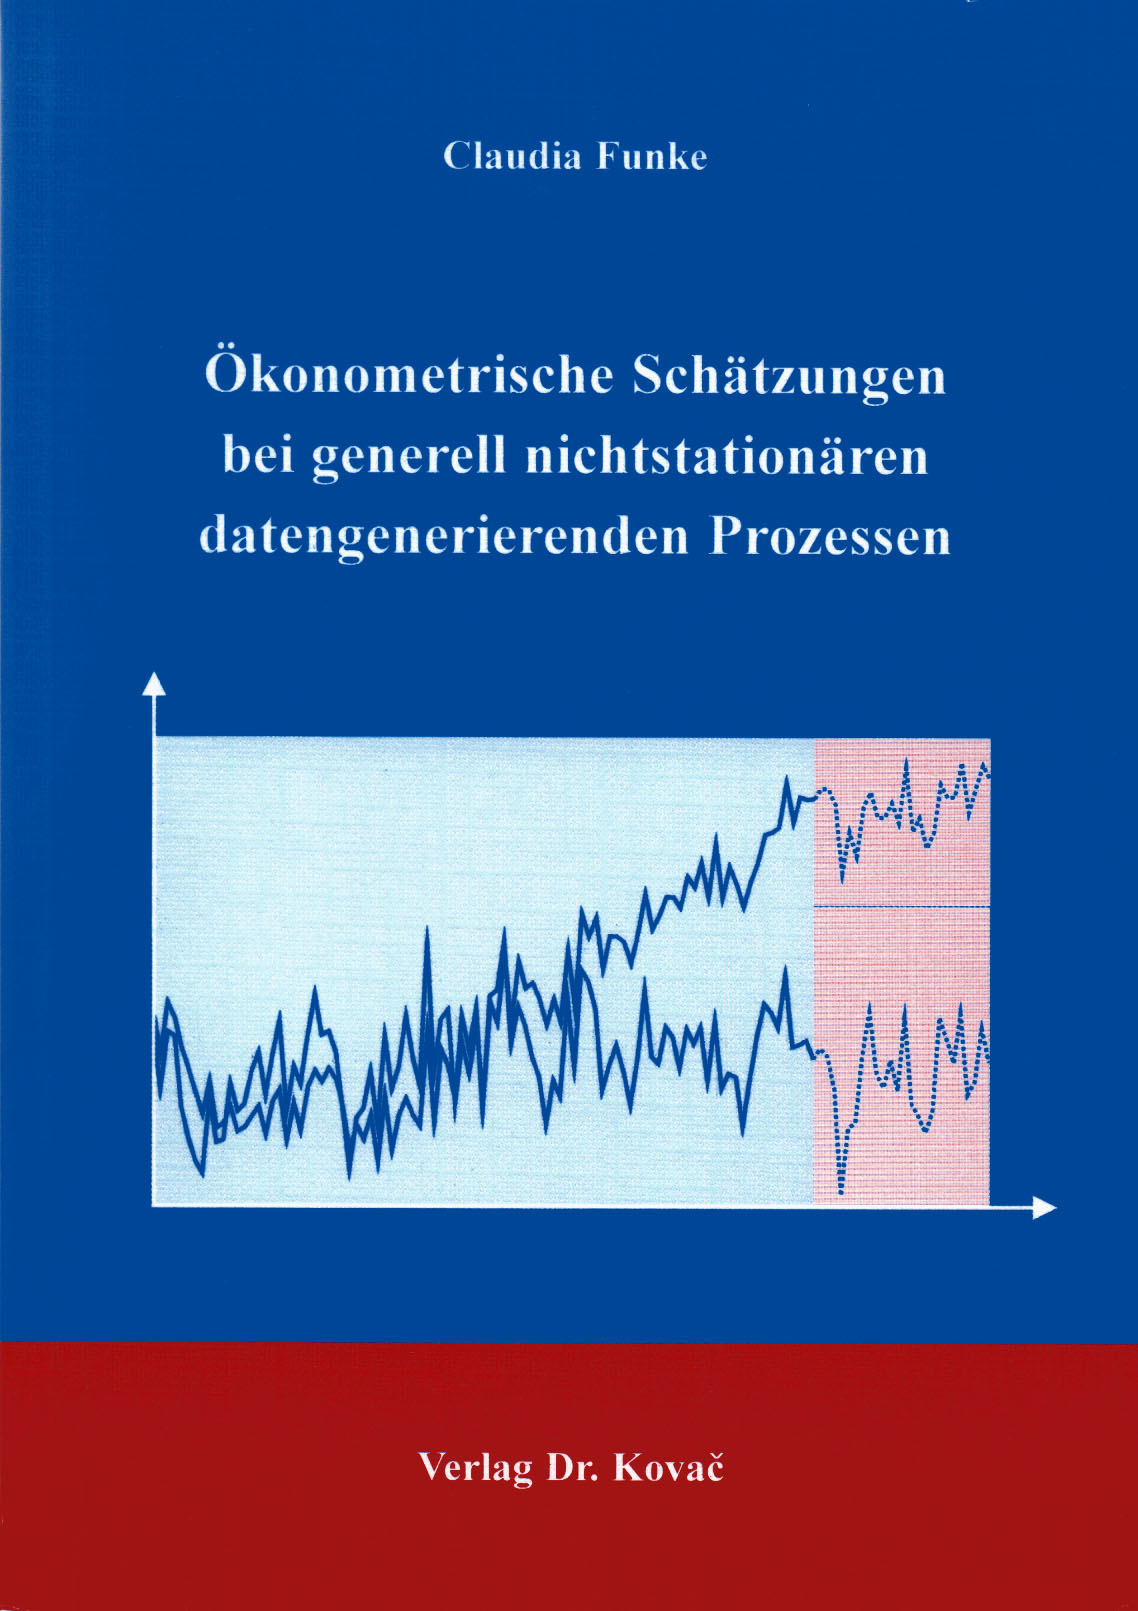 Cover: Ökonometrische Schätzungen bei generell nicht stationären datengenerierenden Prozessen